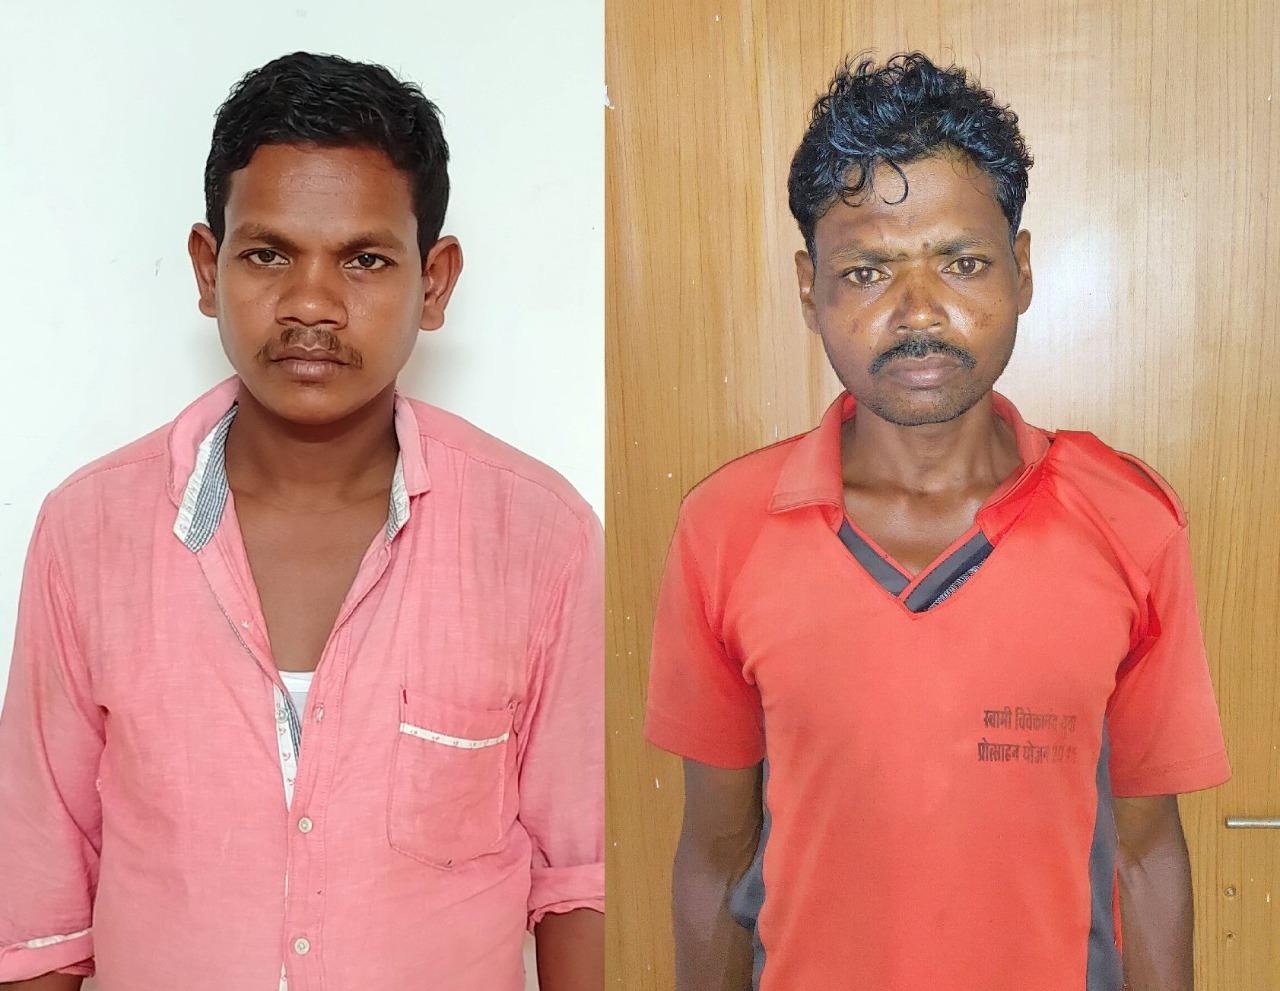 एक स्थायी वारंटी समेत दो नक्सली गिरफ्तार